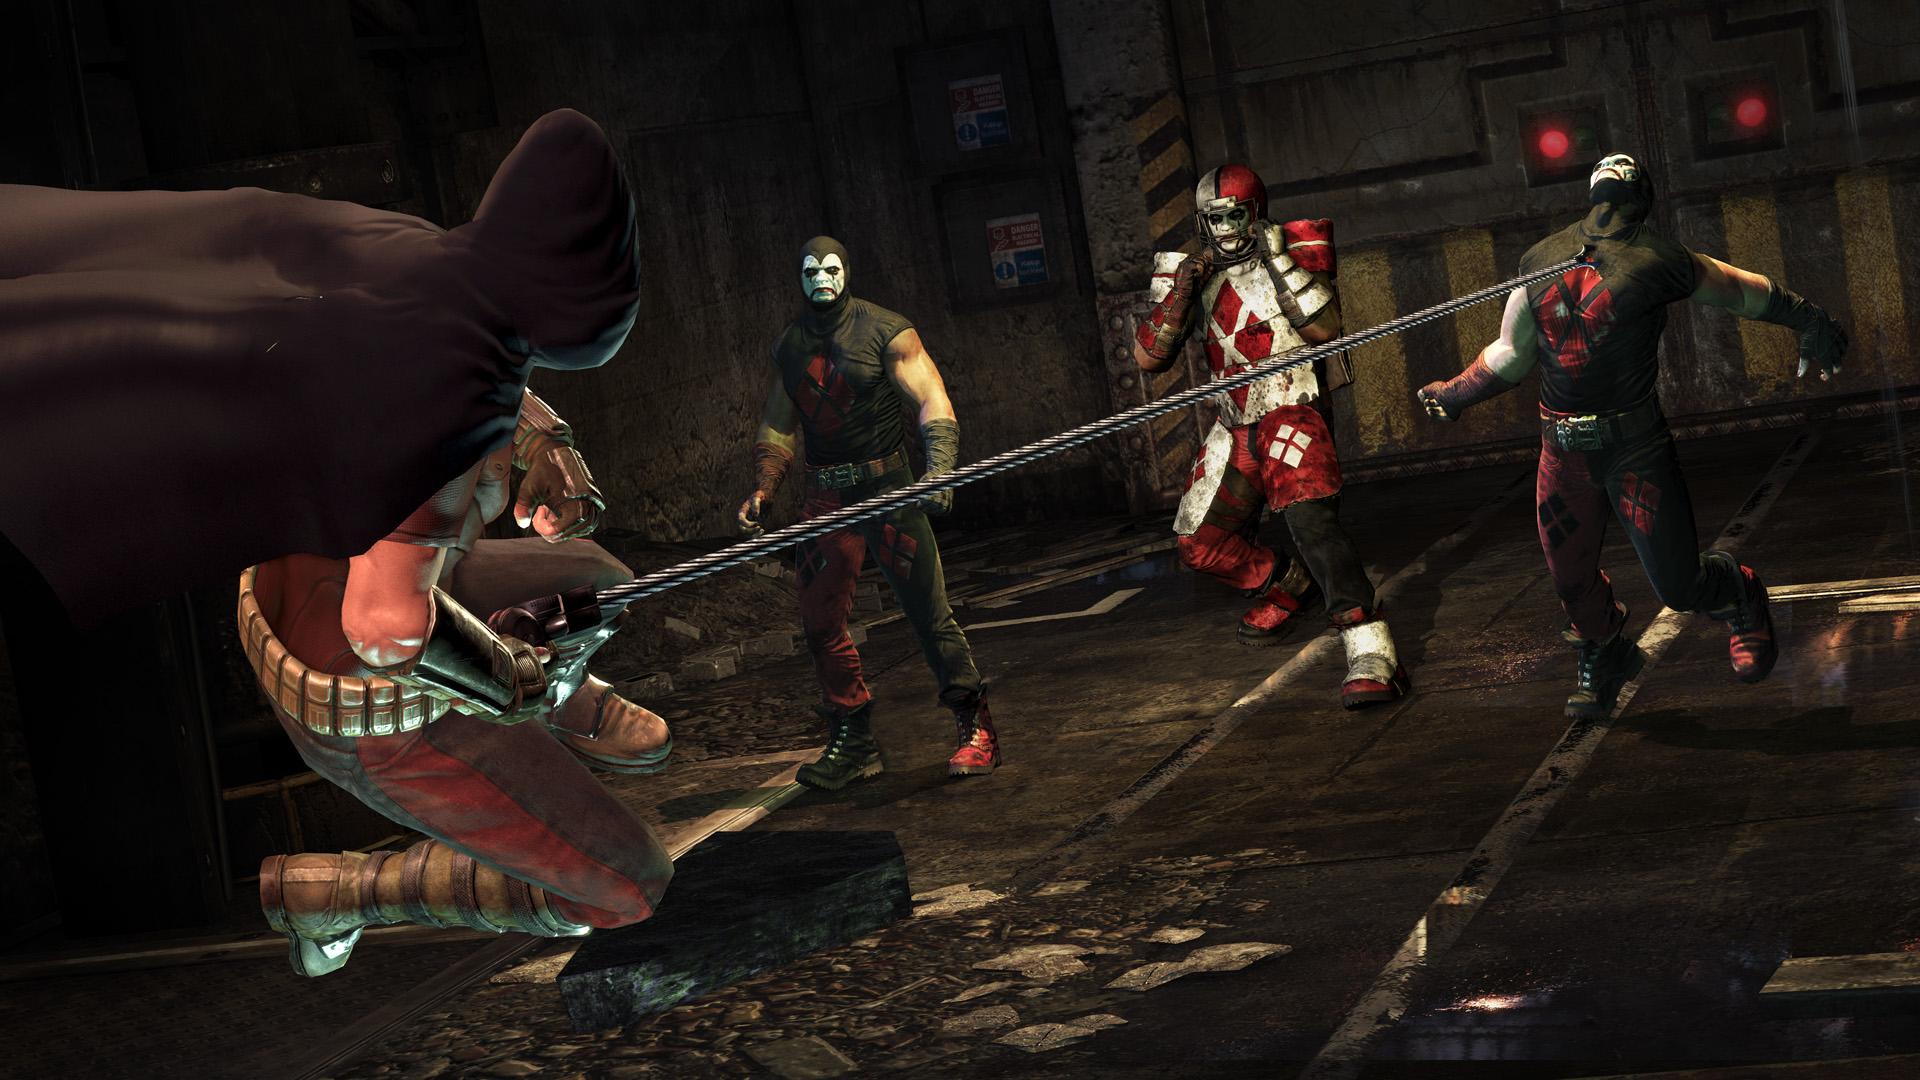 Batman Arkham Origins Dark Knight bet365 reference code bet365 world cup odds description kosovo  Skin